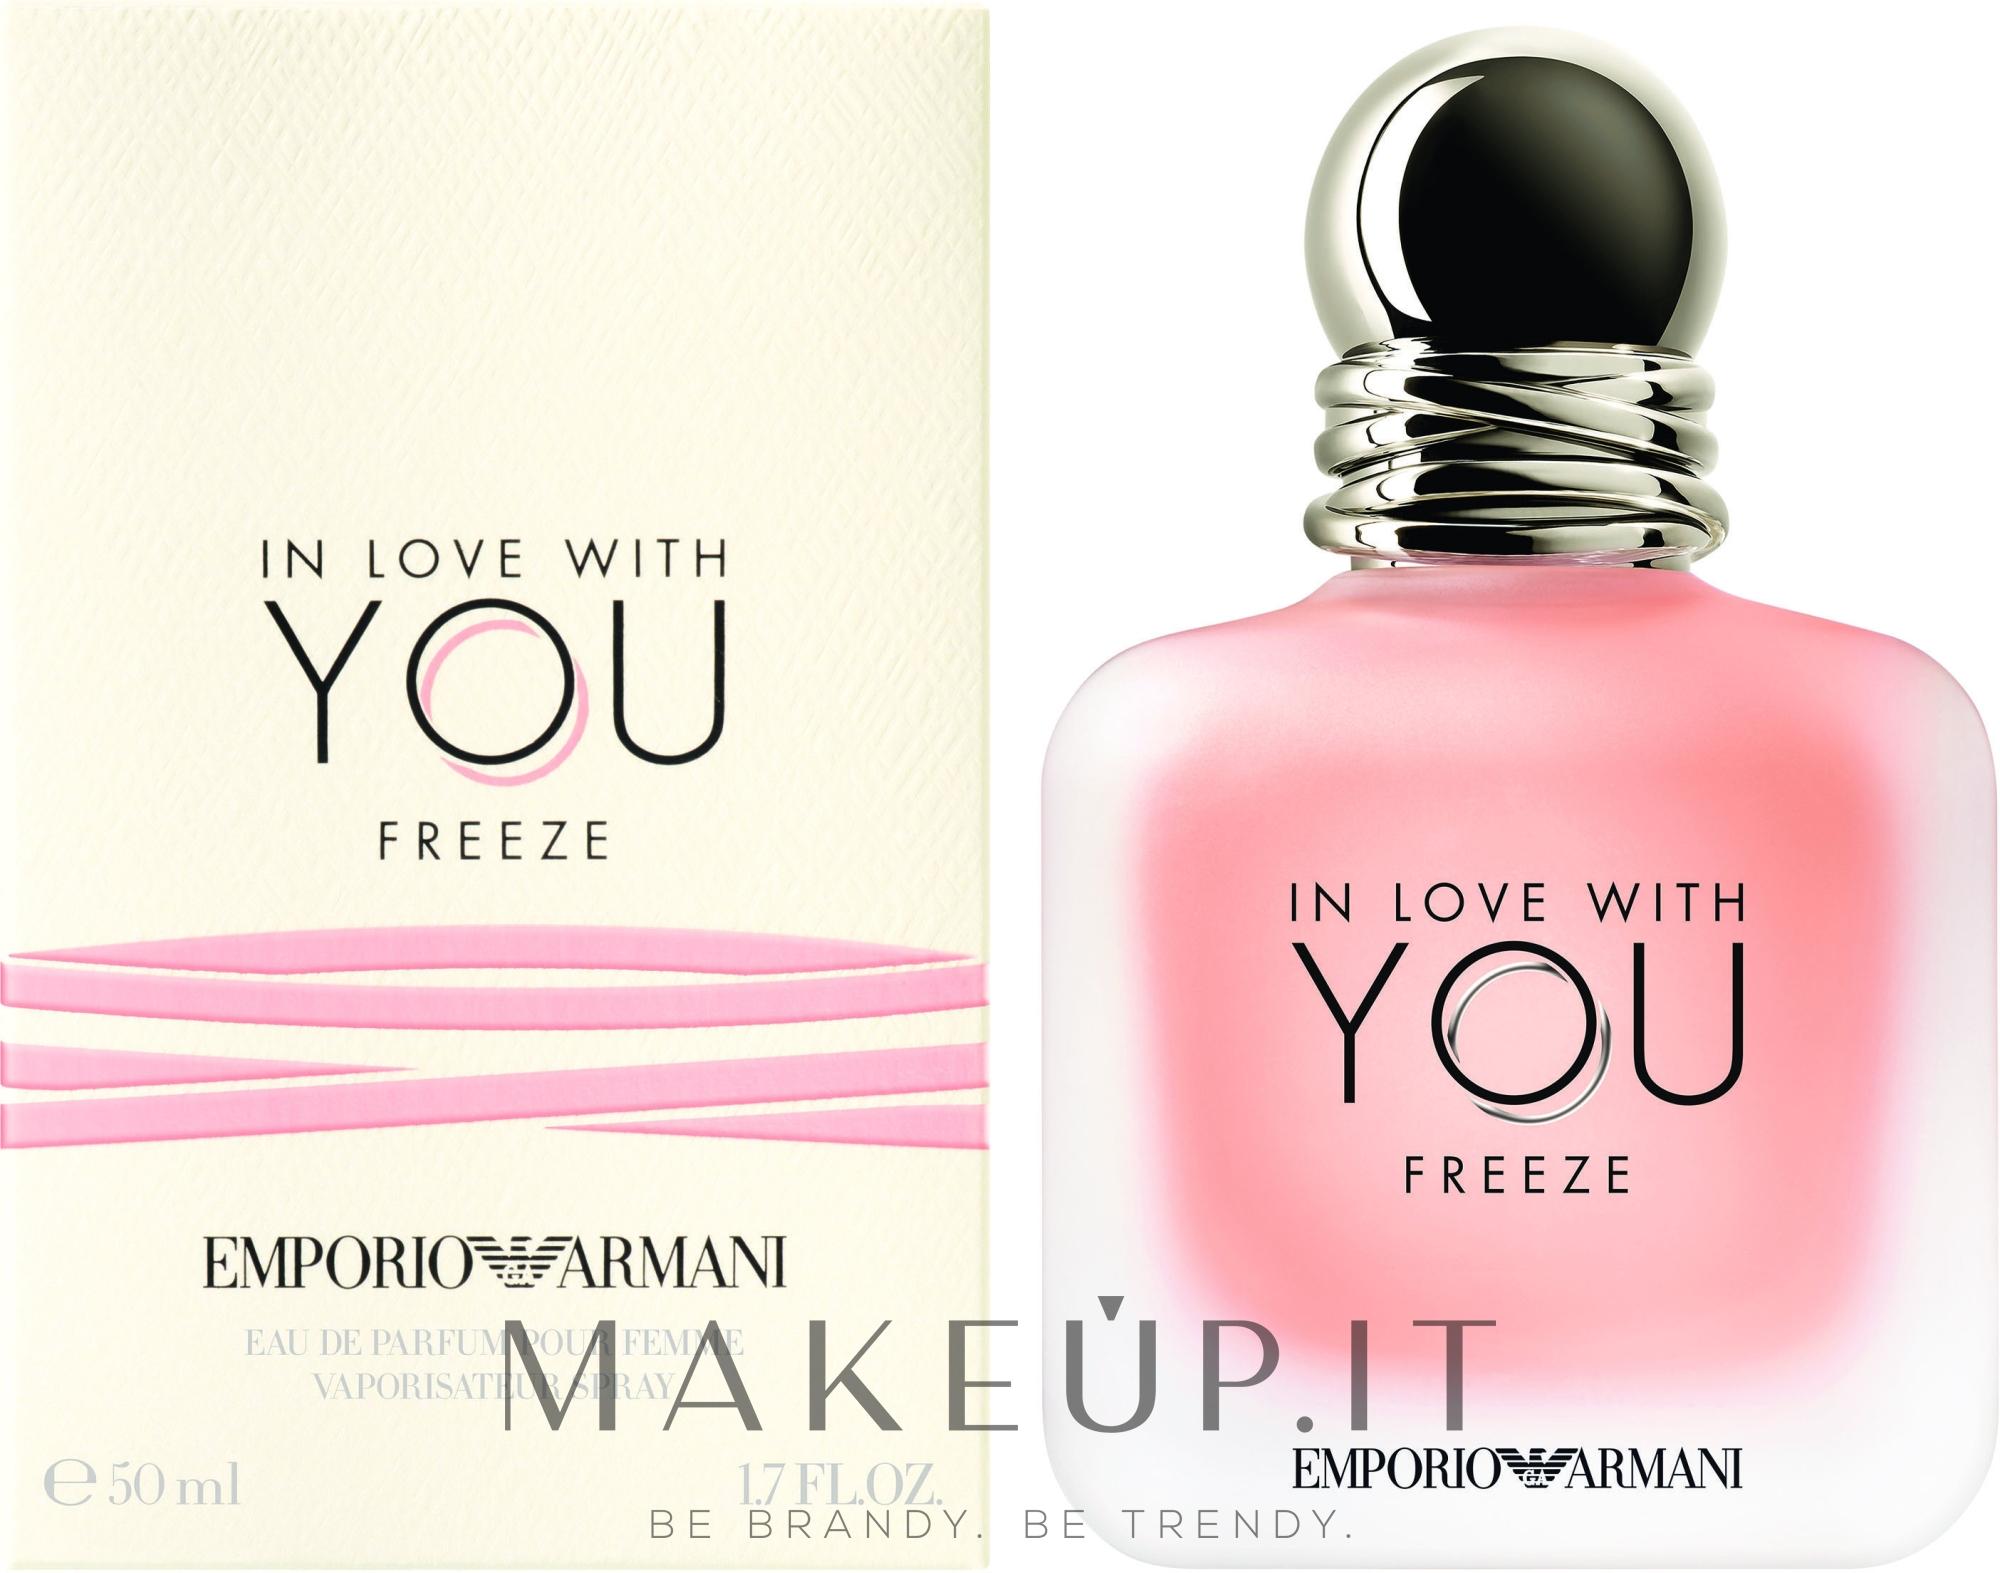 Giorgio Armani Emporio Armani In Love With You Freeze - Eau de parfum — foto 50 ml